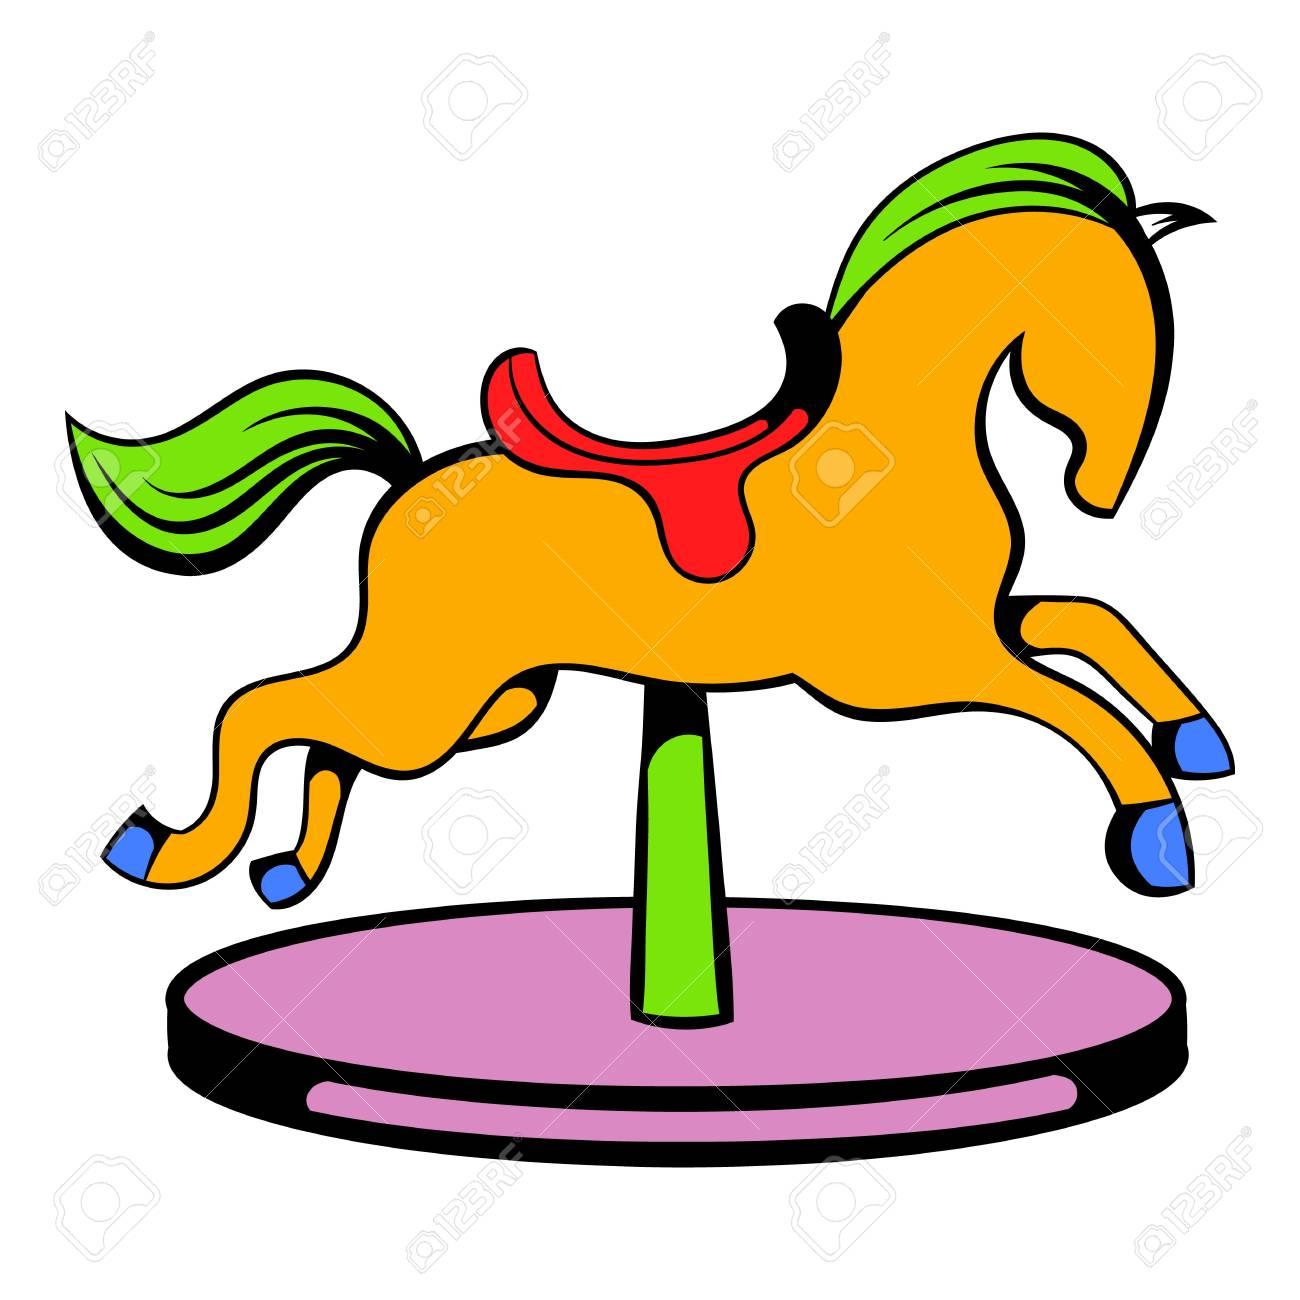 Carrousel Dessin icône du cheval de carrousel, icone dessin animé clip art libres de